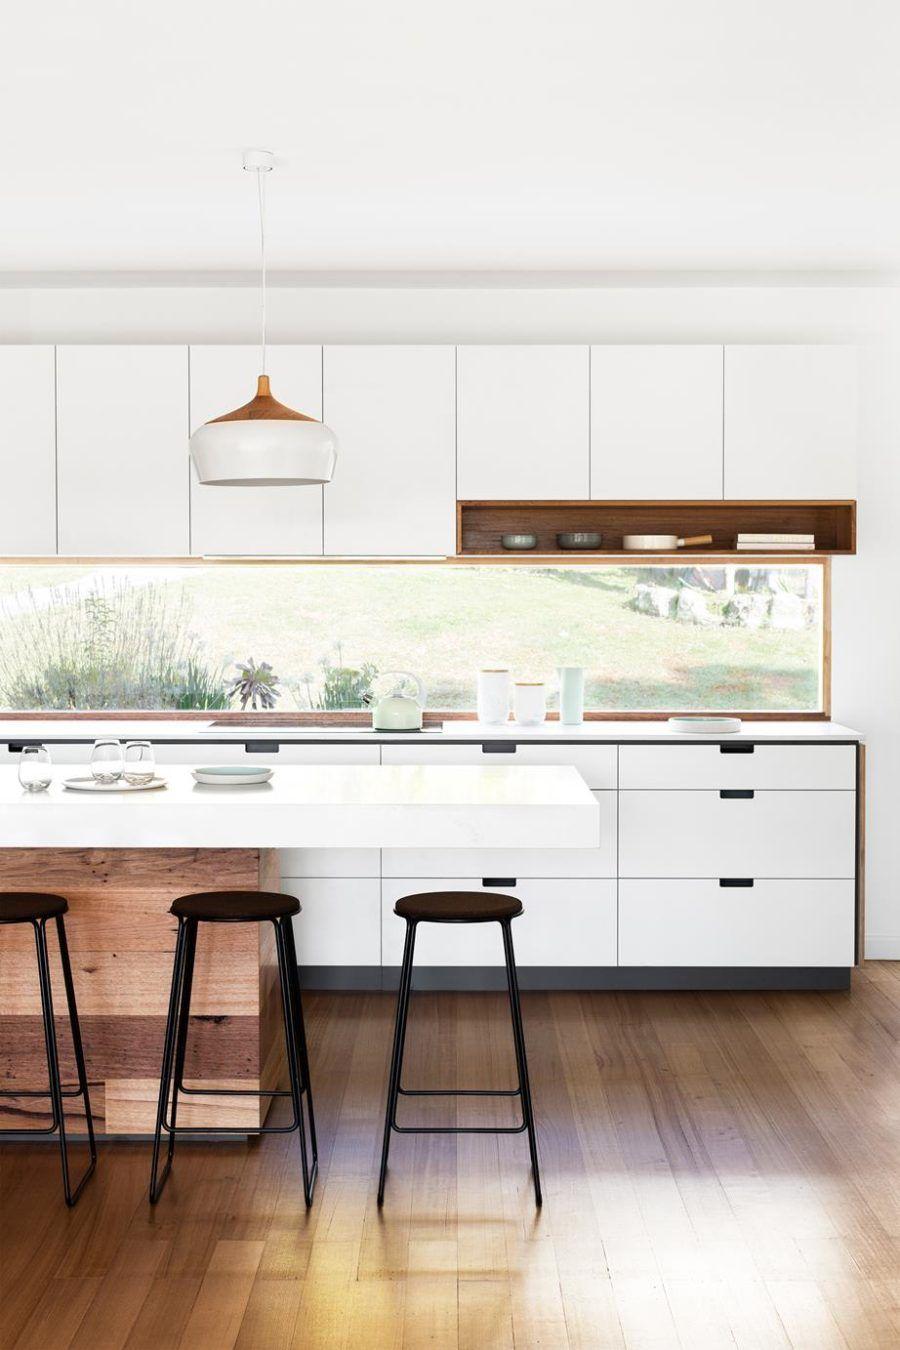 Modern Kitchen Backsplash Ideas for Cooking With Style | Pinterest ...